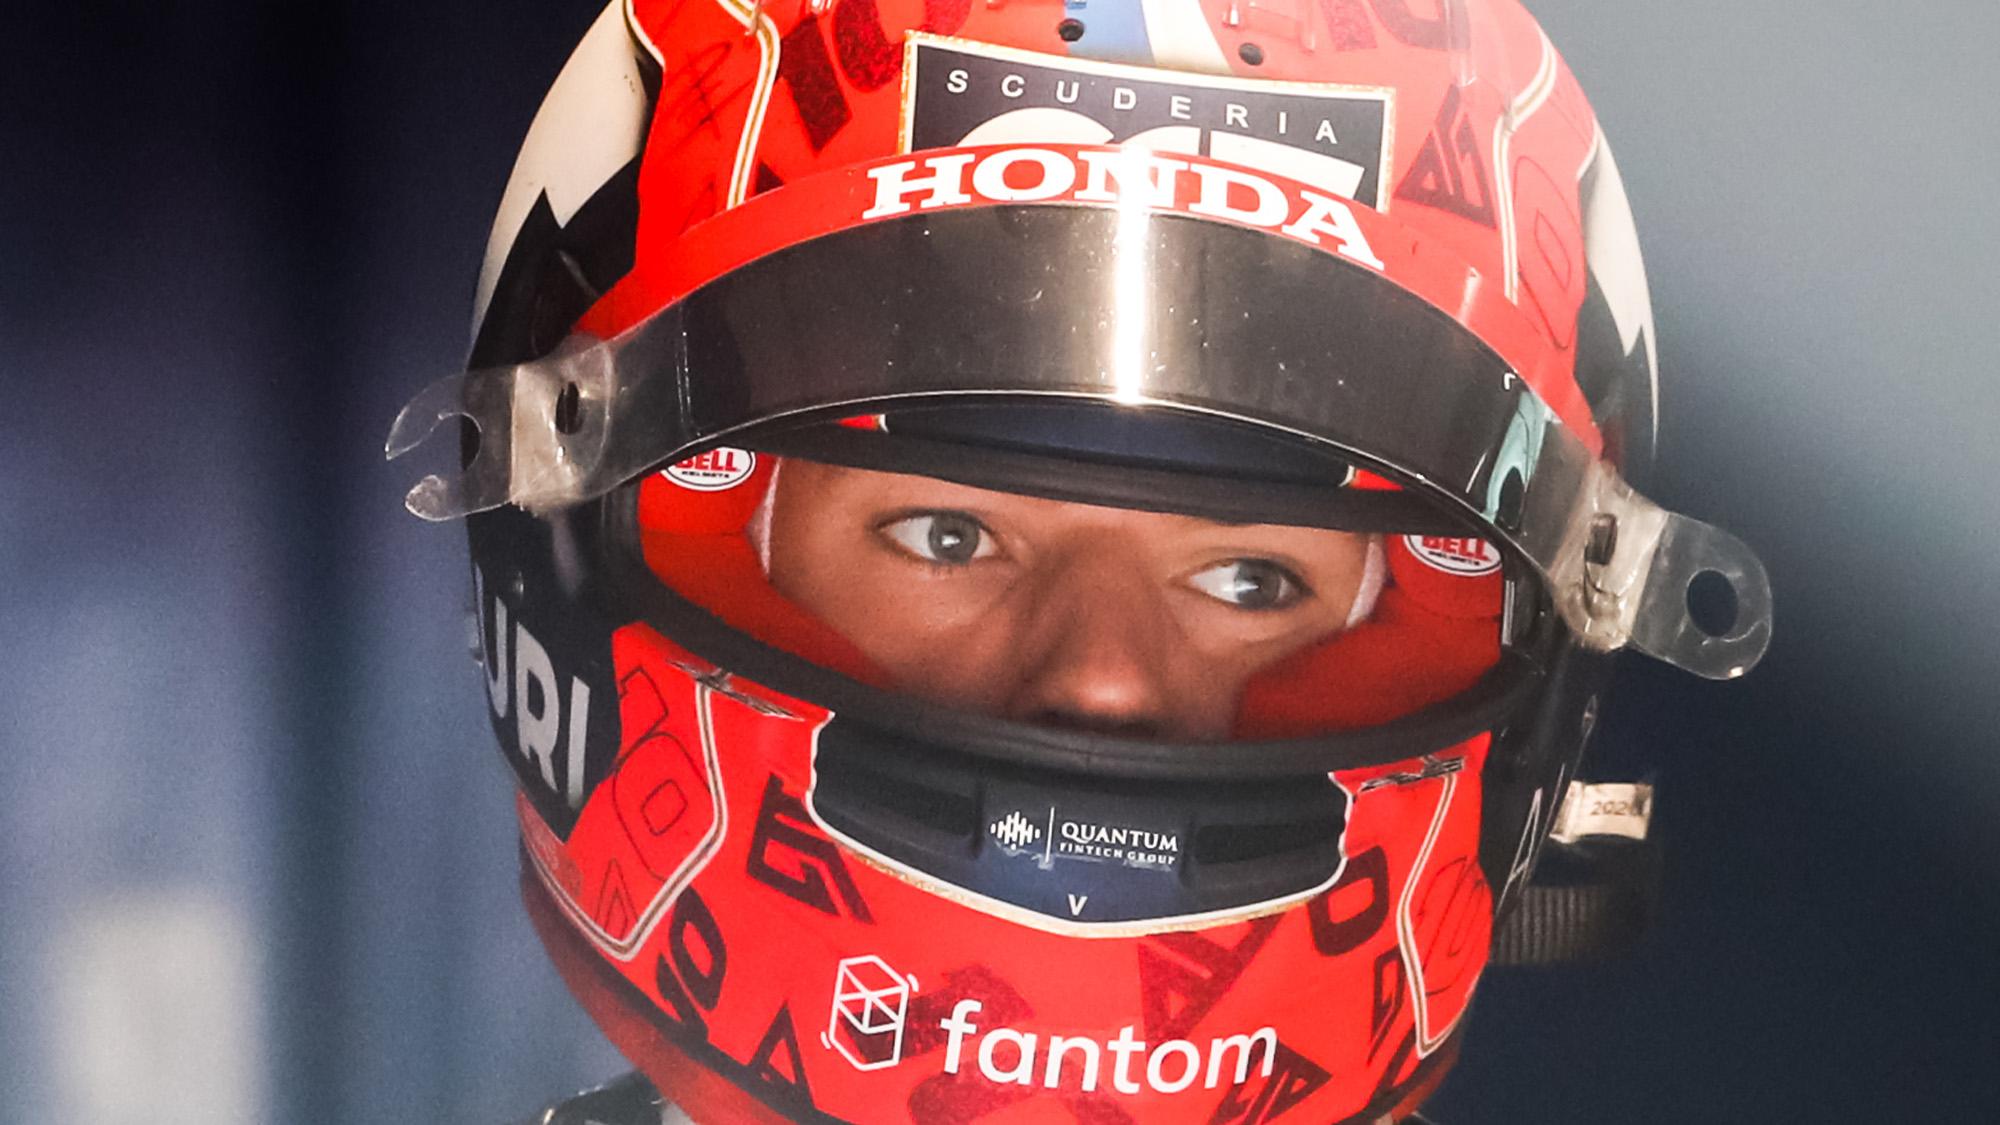 Pierre Gasly looks through the visor of his helmet